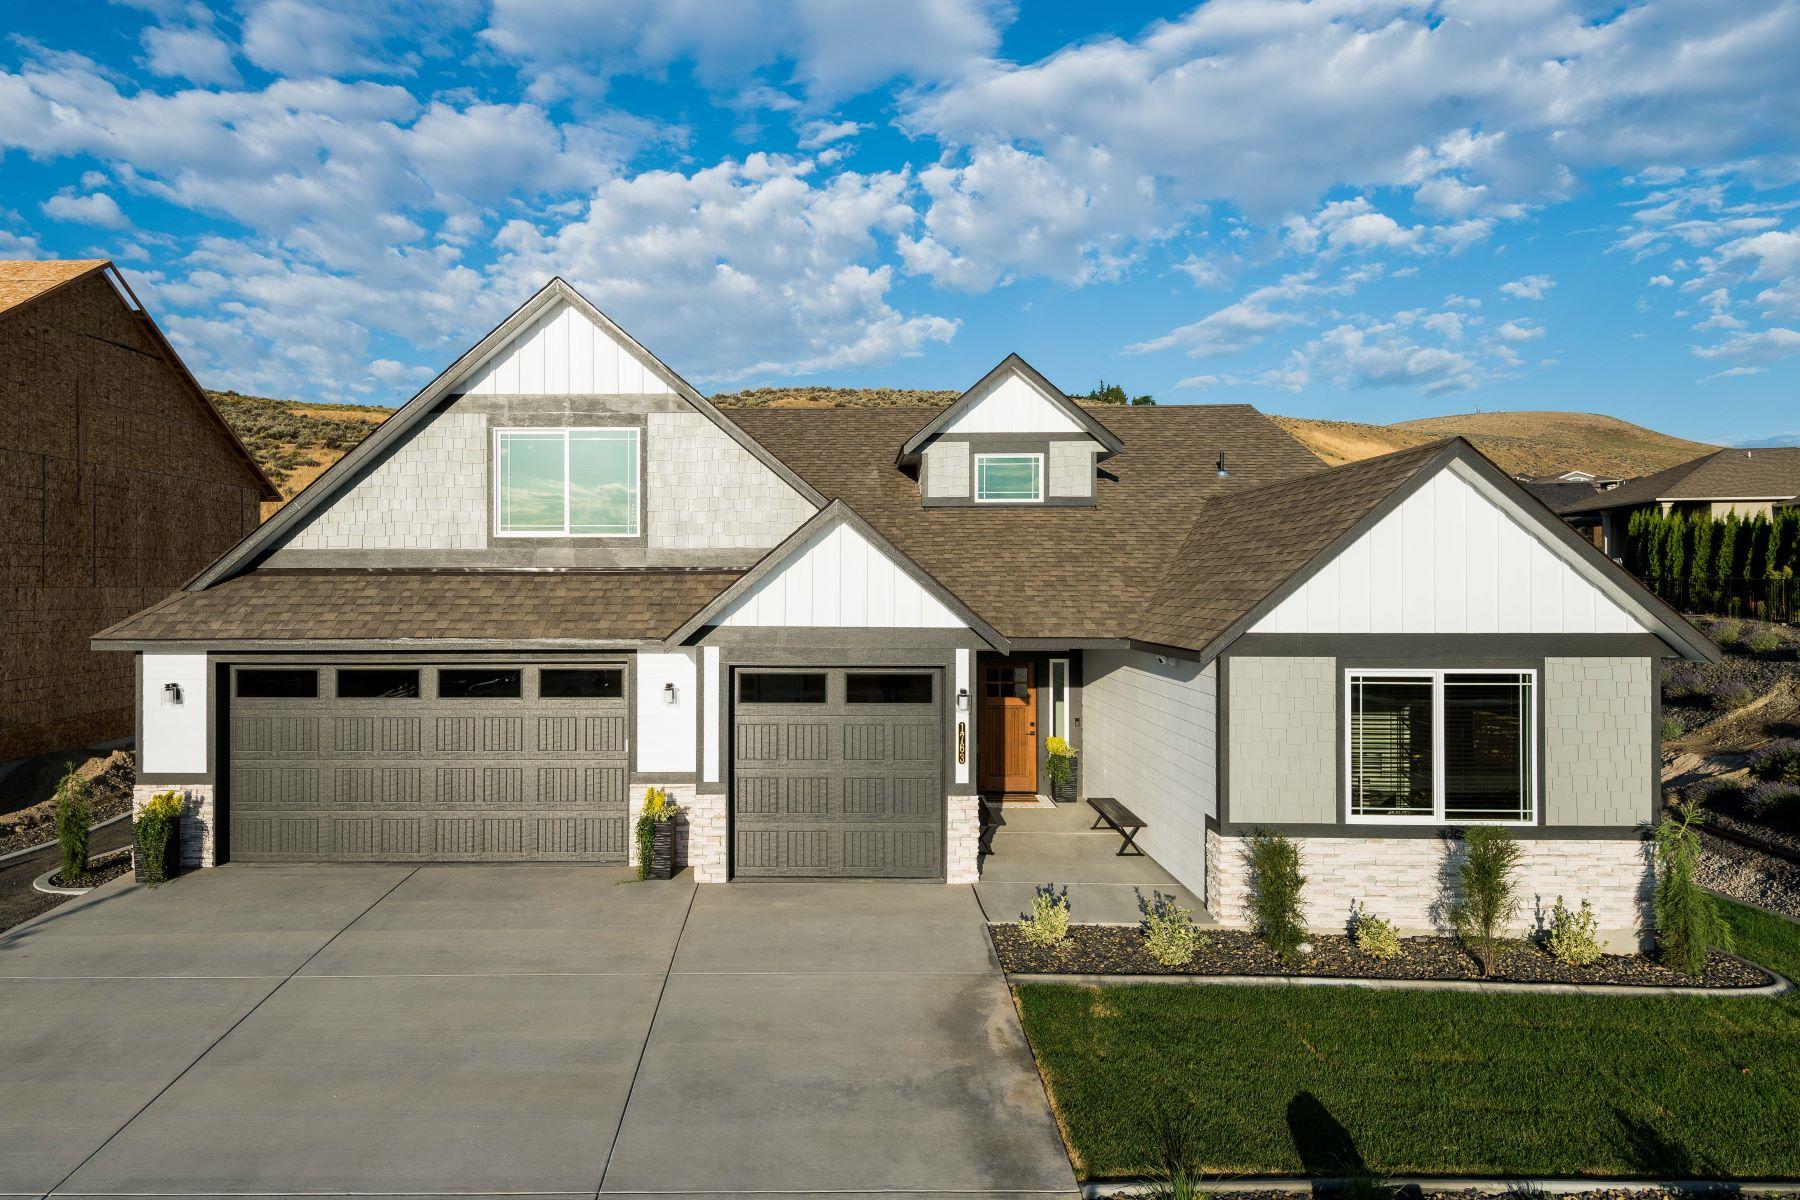 Single Family Homes for Sale at Viking Builders Valiant Plan 1763 Sicily Lane Richland, Washington 99352 United States